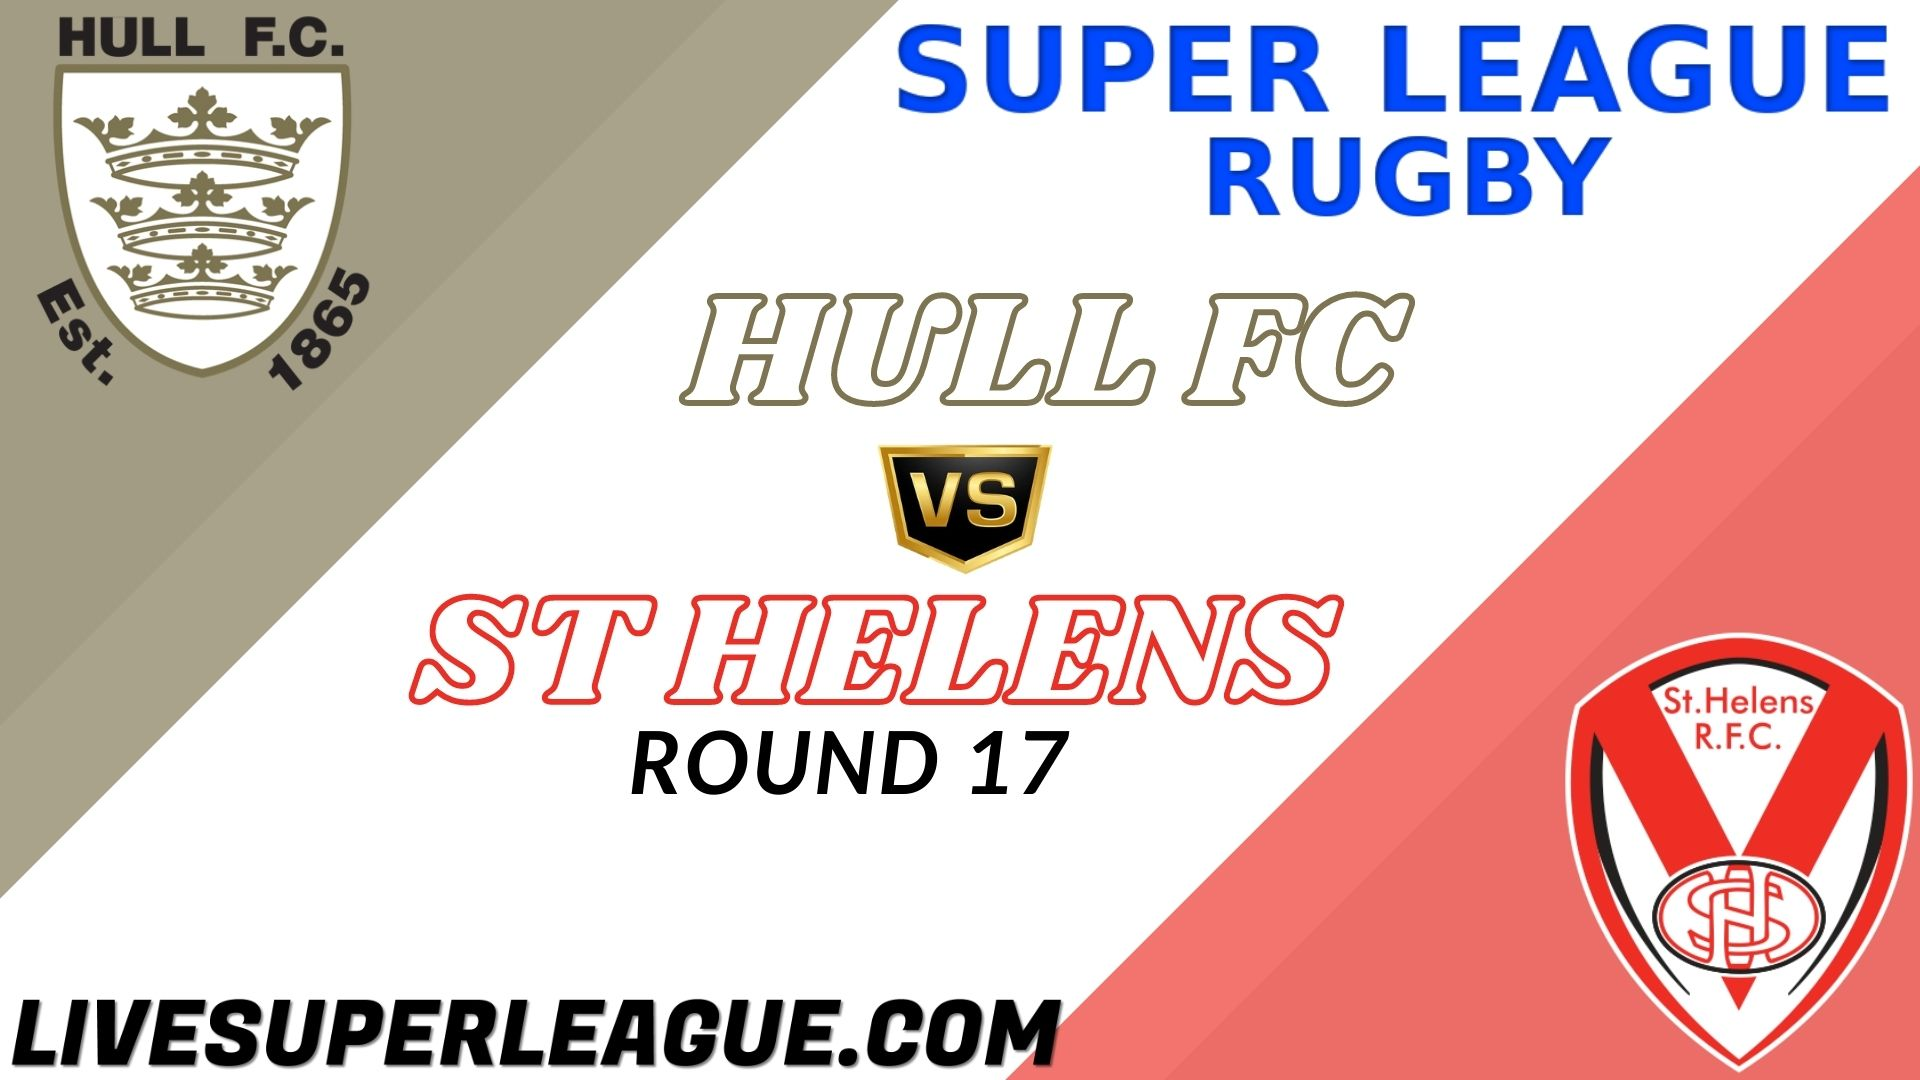 Hull FC Vs St Helens RD 17 Live Stream 2021 | Full Match Replay